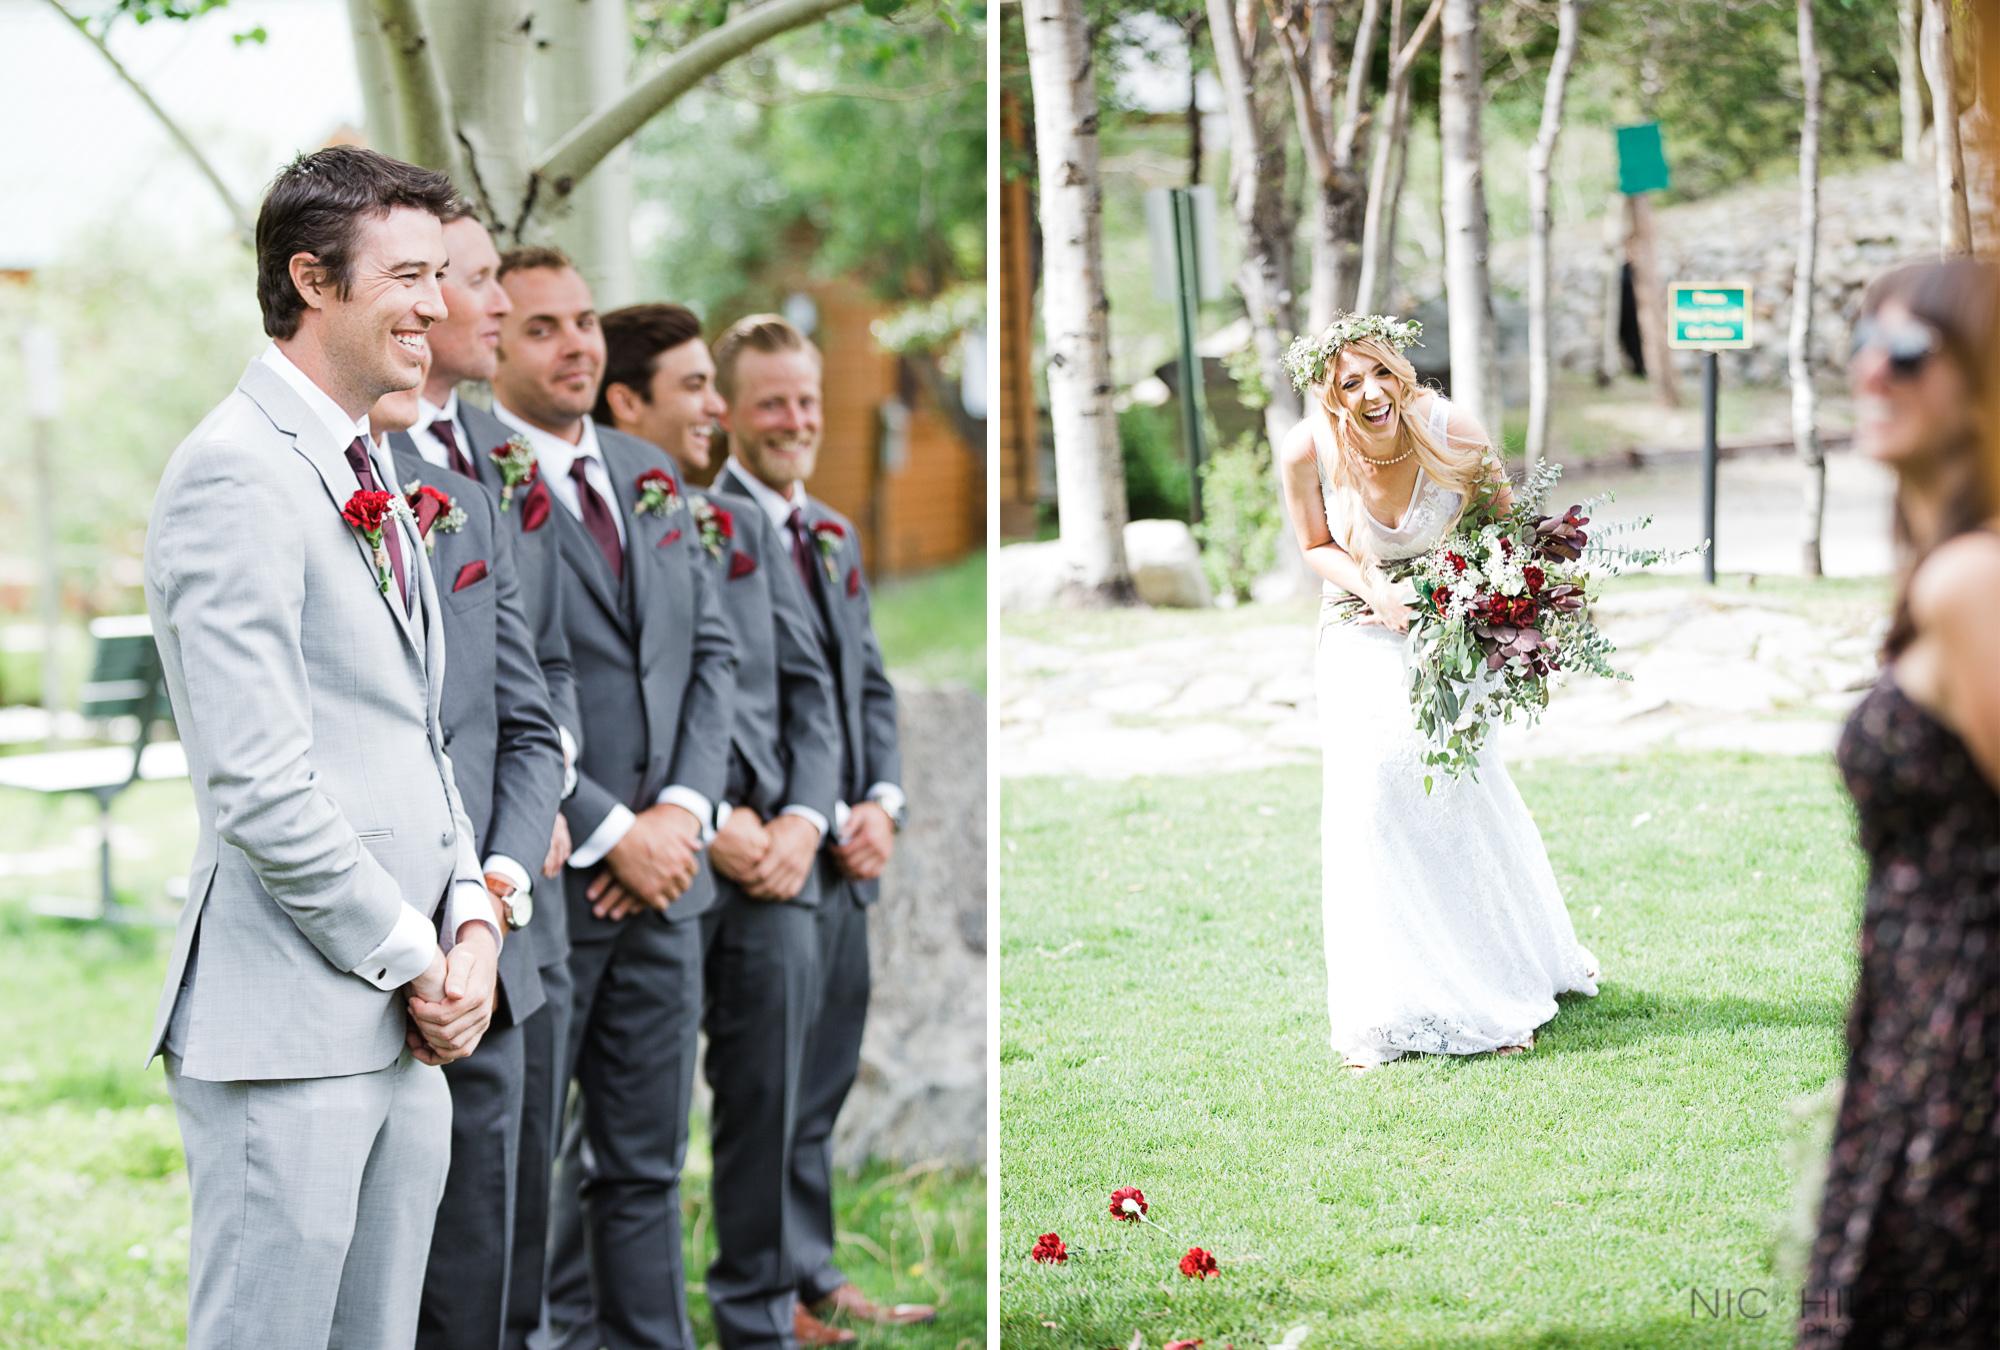 June-Lake-Wedding-Ceremony-Processional.jpg